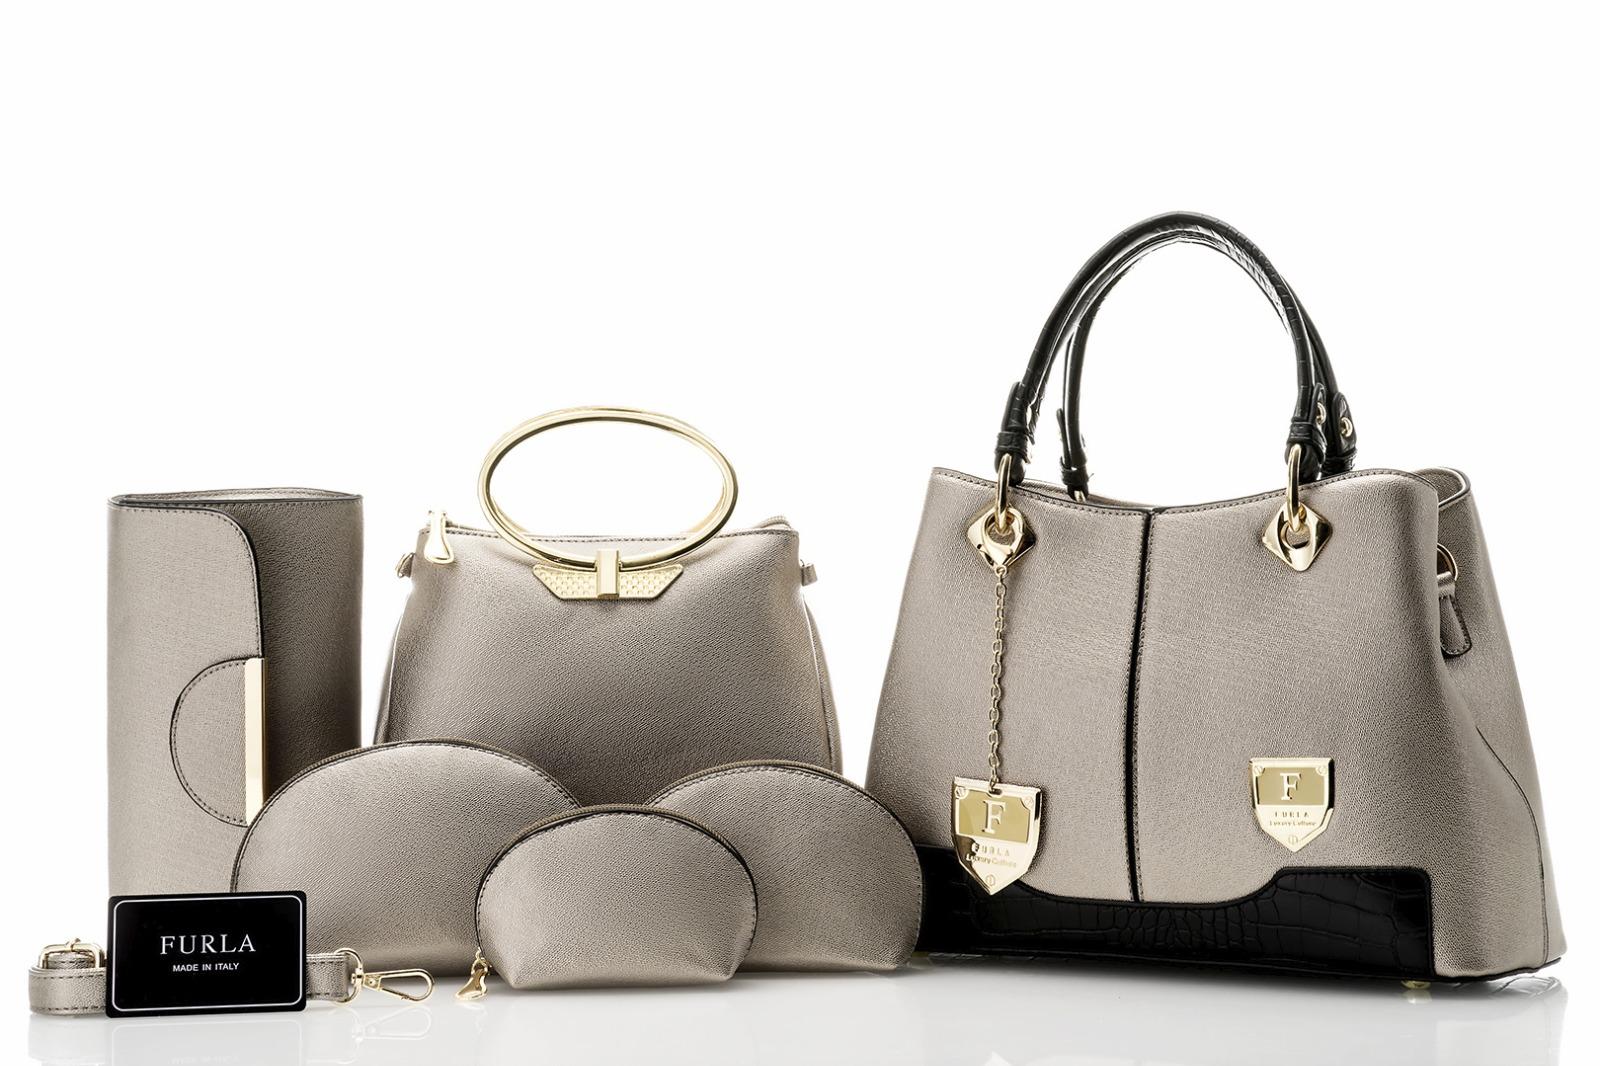 Borong beg furla branded murah malaysia jual tas furla terbaru jpg  1600x1066 Tas terbaru dan murah bffd66779c